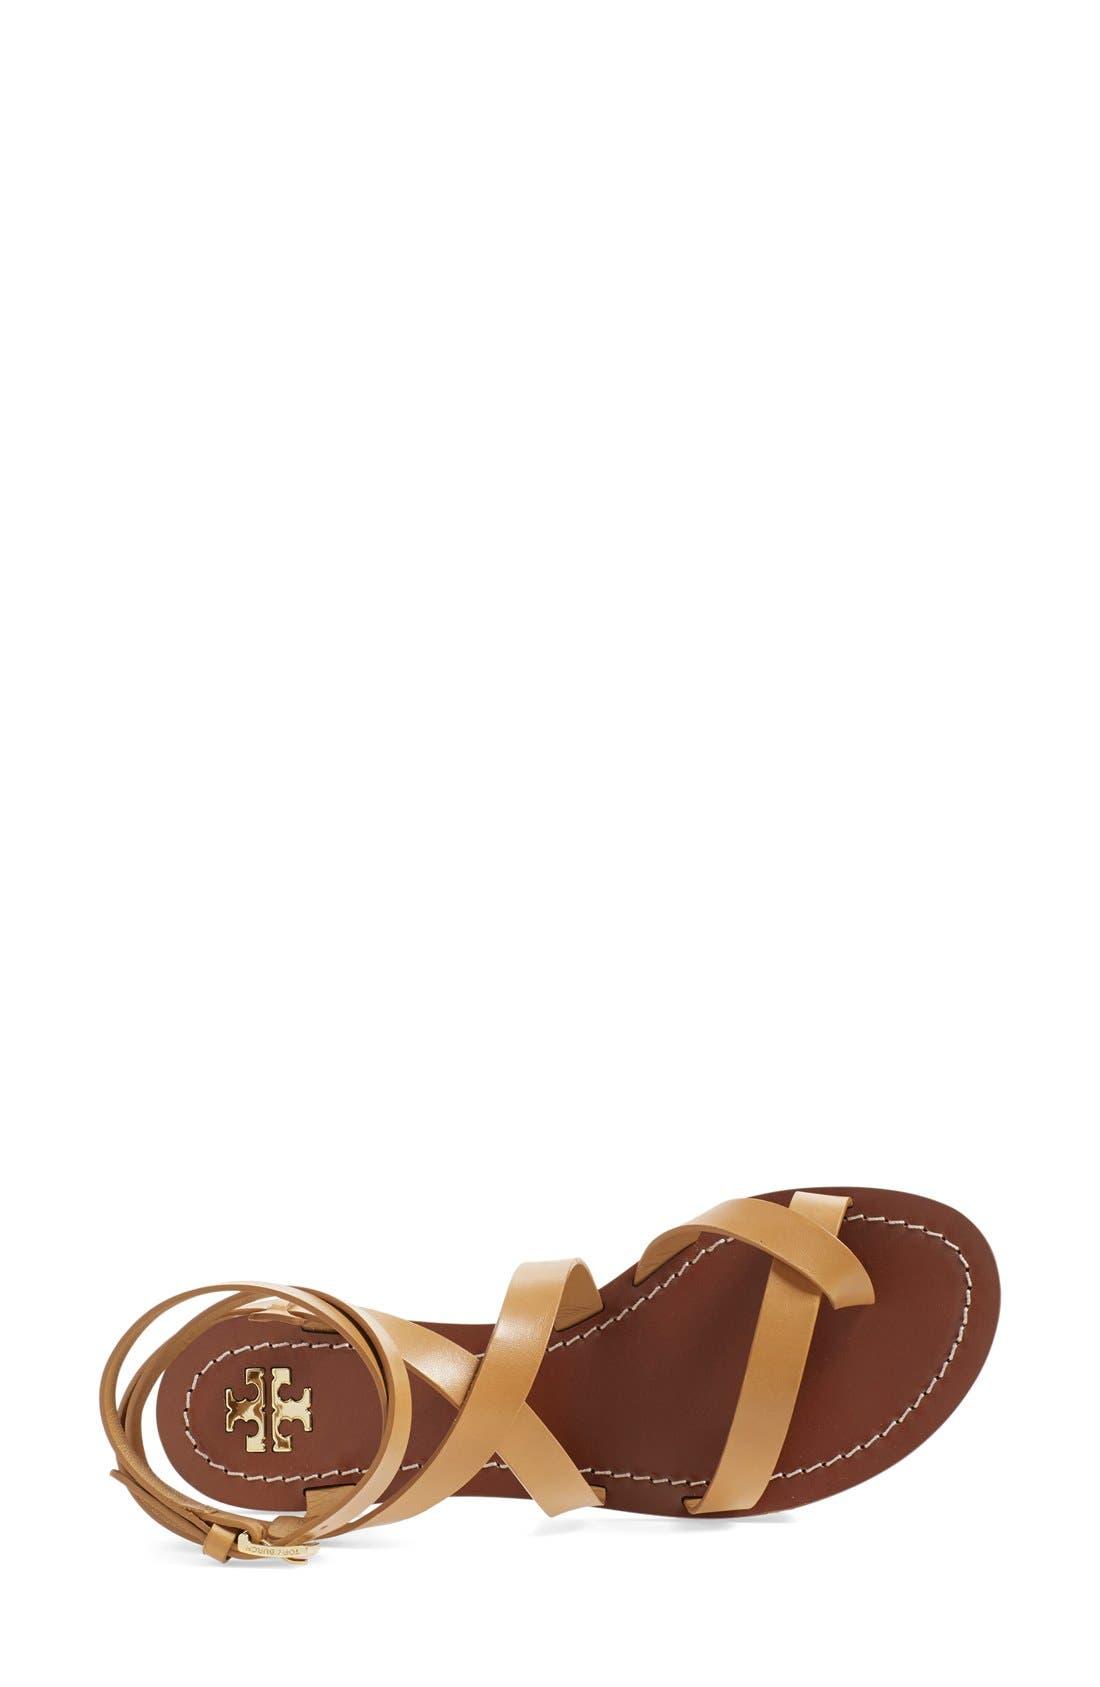 'Patos' Gladiator Sandal,                             Alternate thumbnail 3, color,                             Blond Manark Vachetta